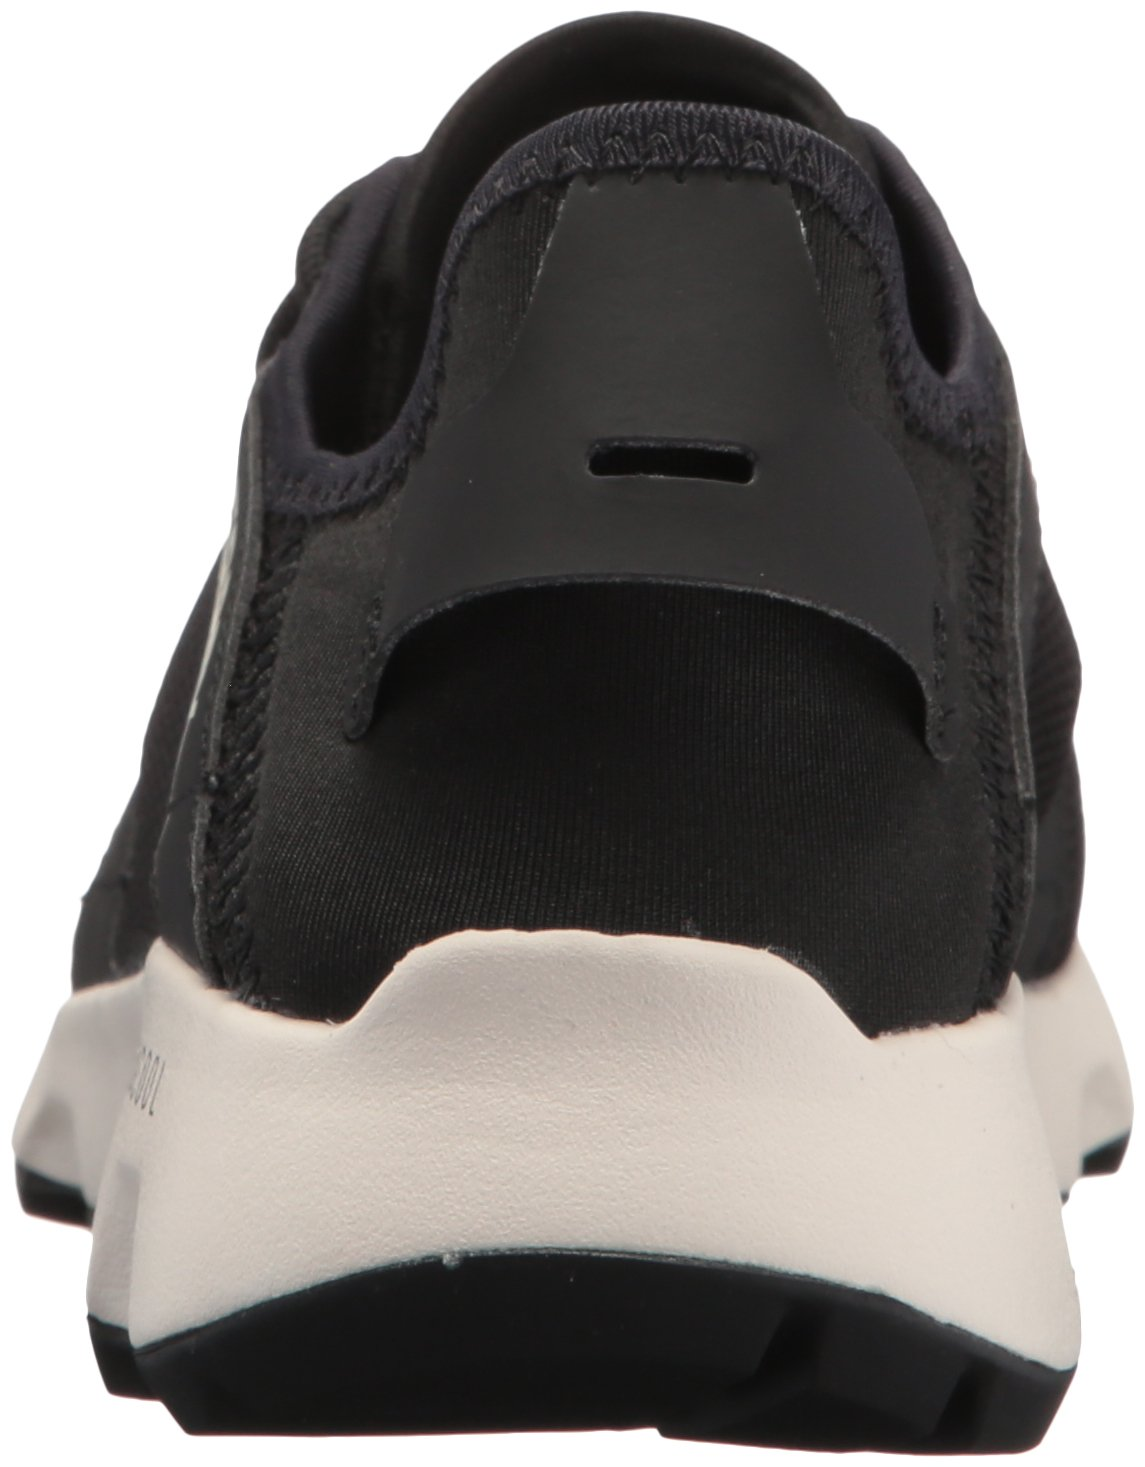 Adidas 2016 Zapatillas vit